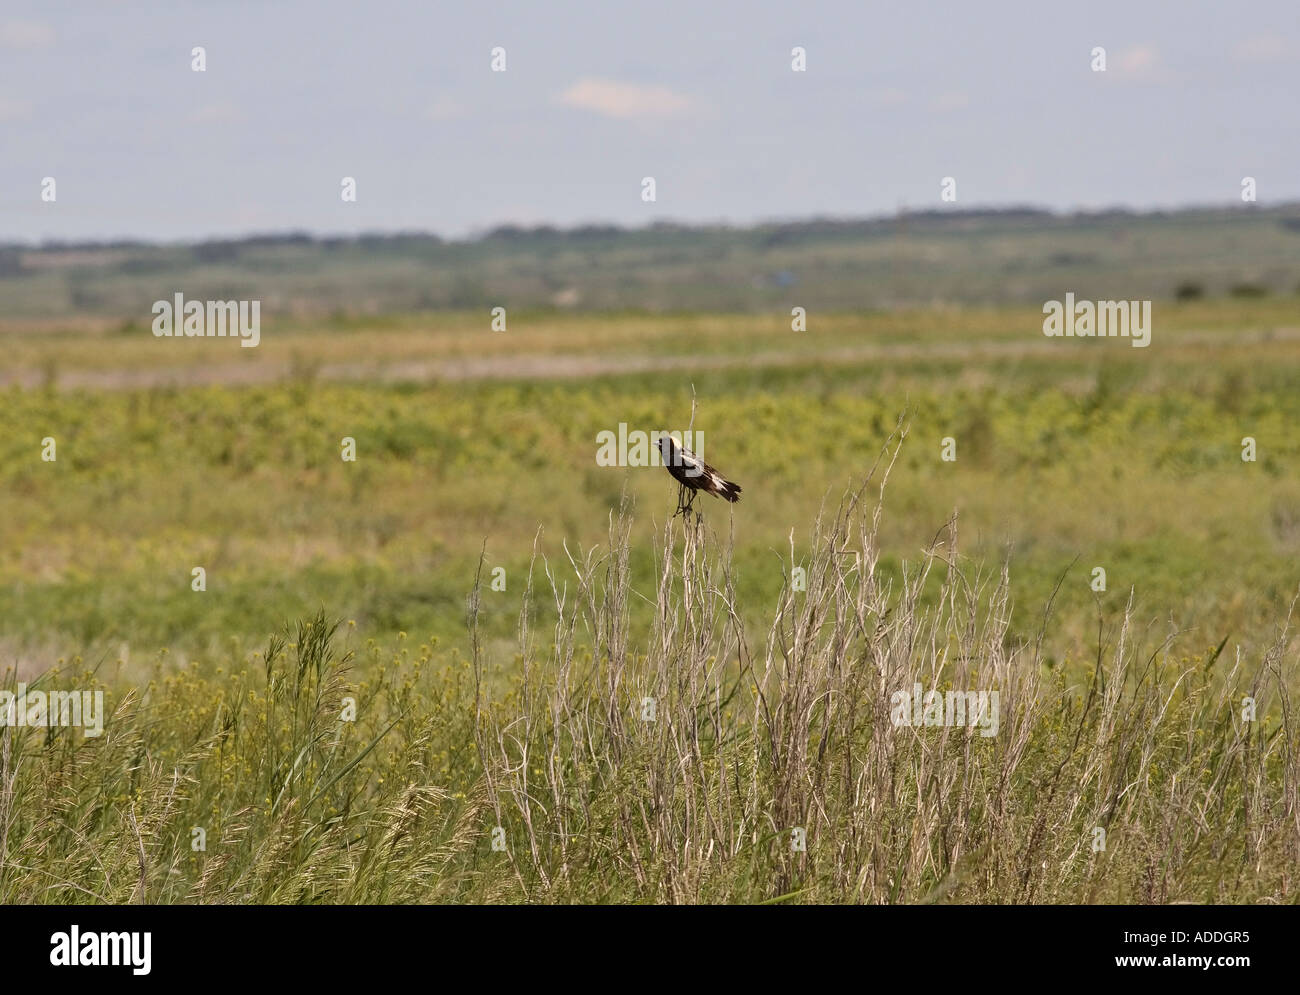 Male Bobolink in scenic Saskatchewan Canada - Stock Image